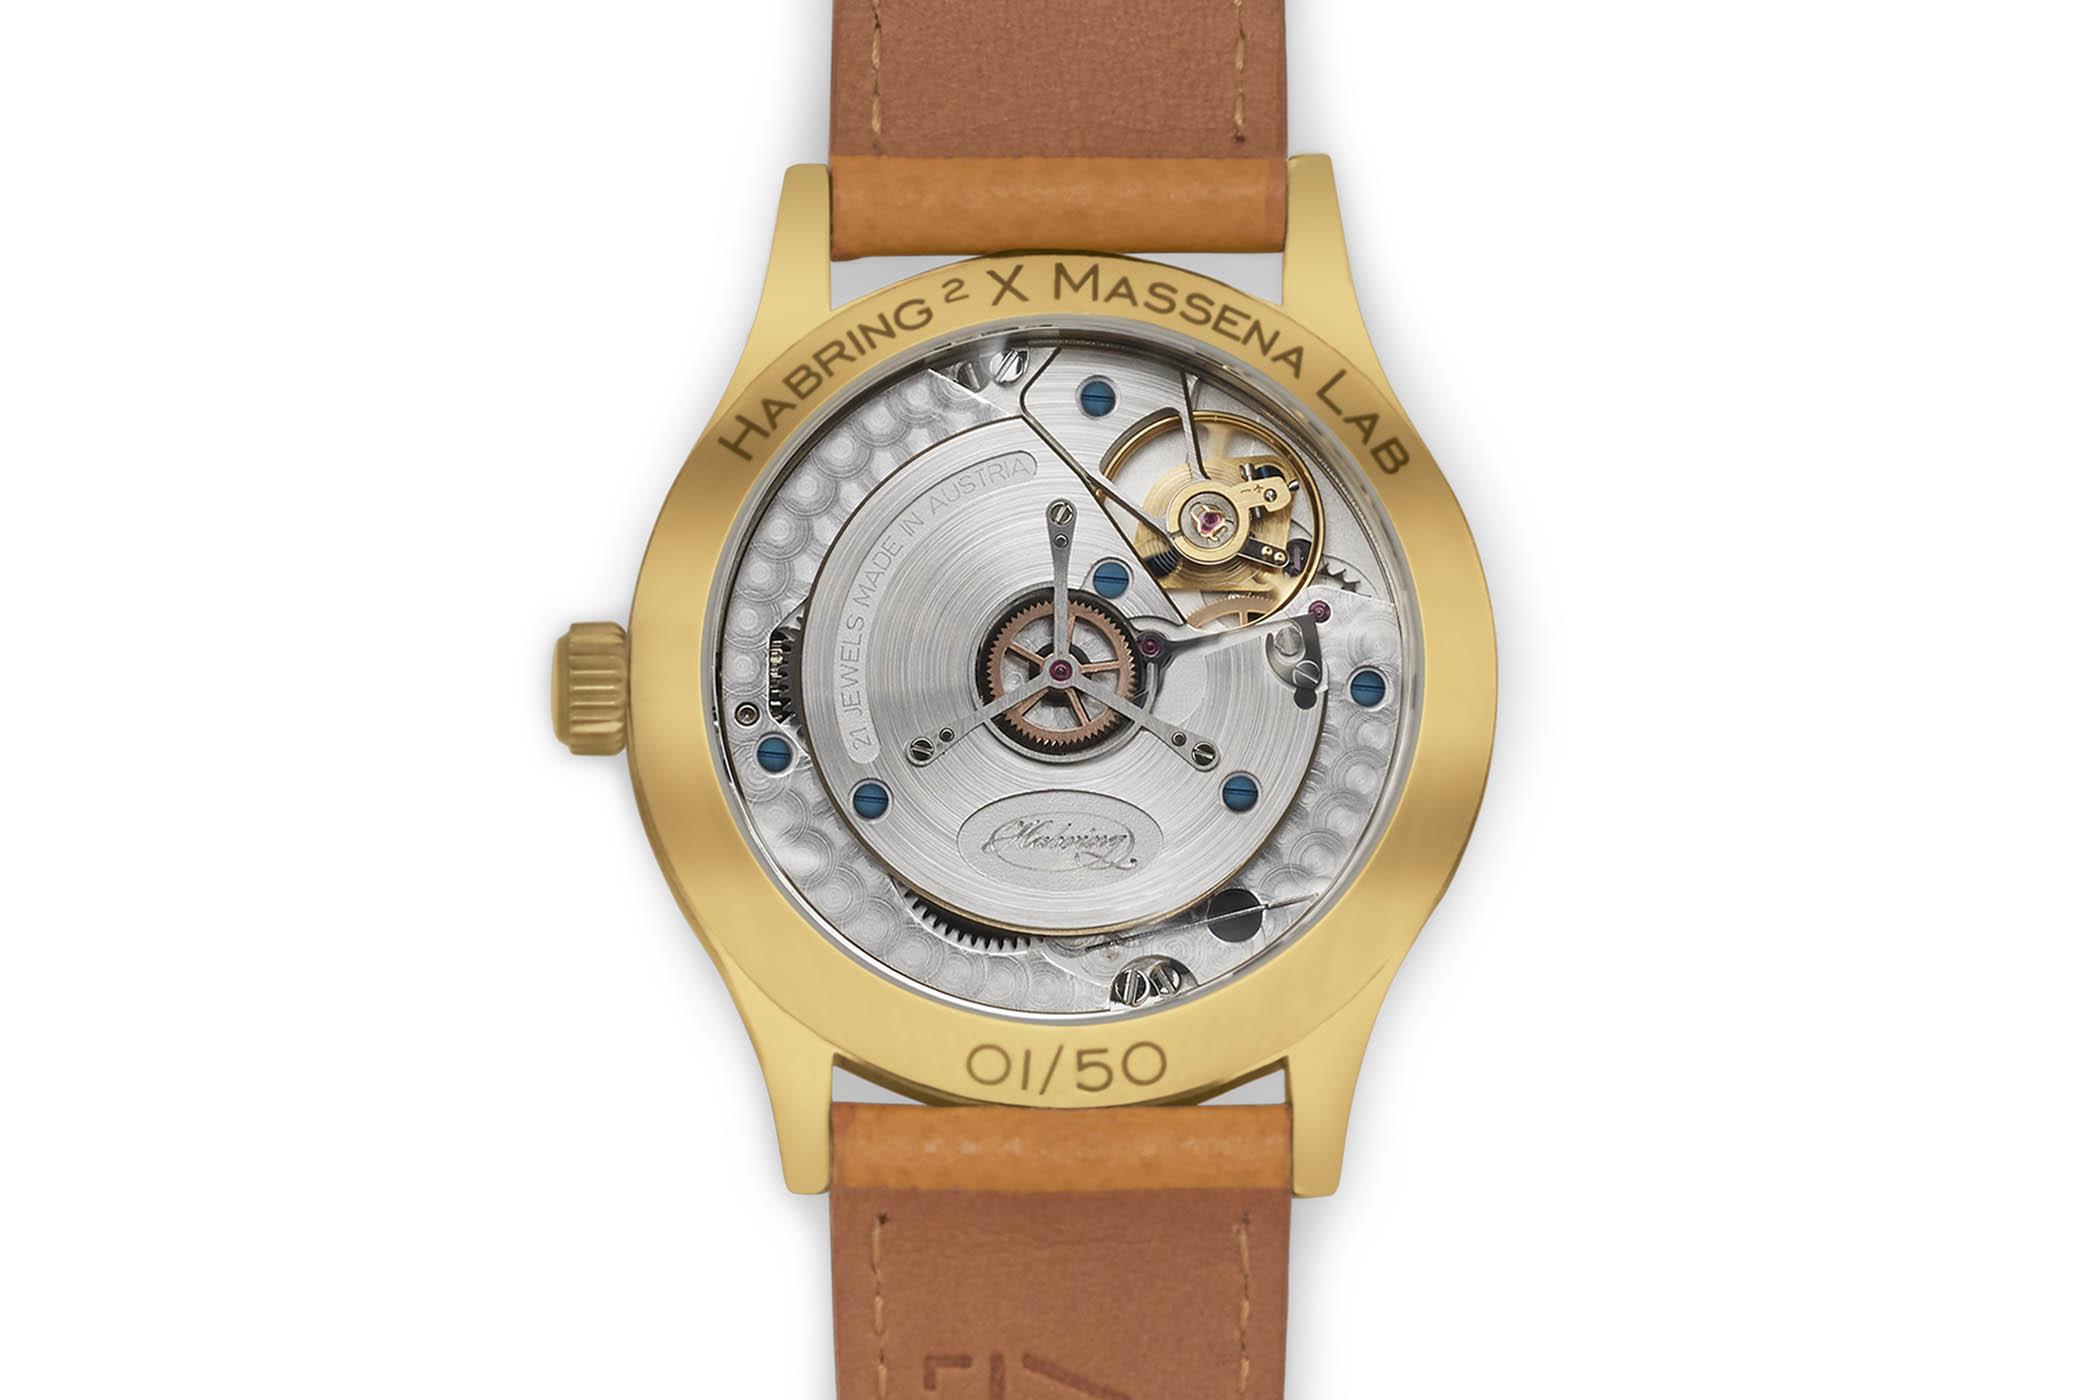 Habring2 Erwin LAB01 Massena Bronze sector dial deadbeat second - 2